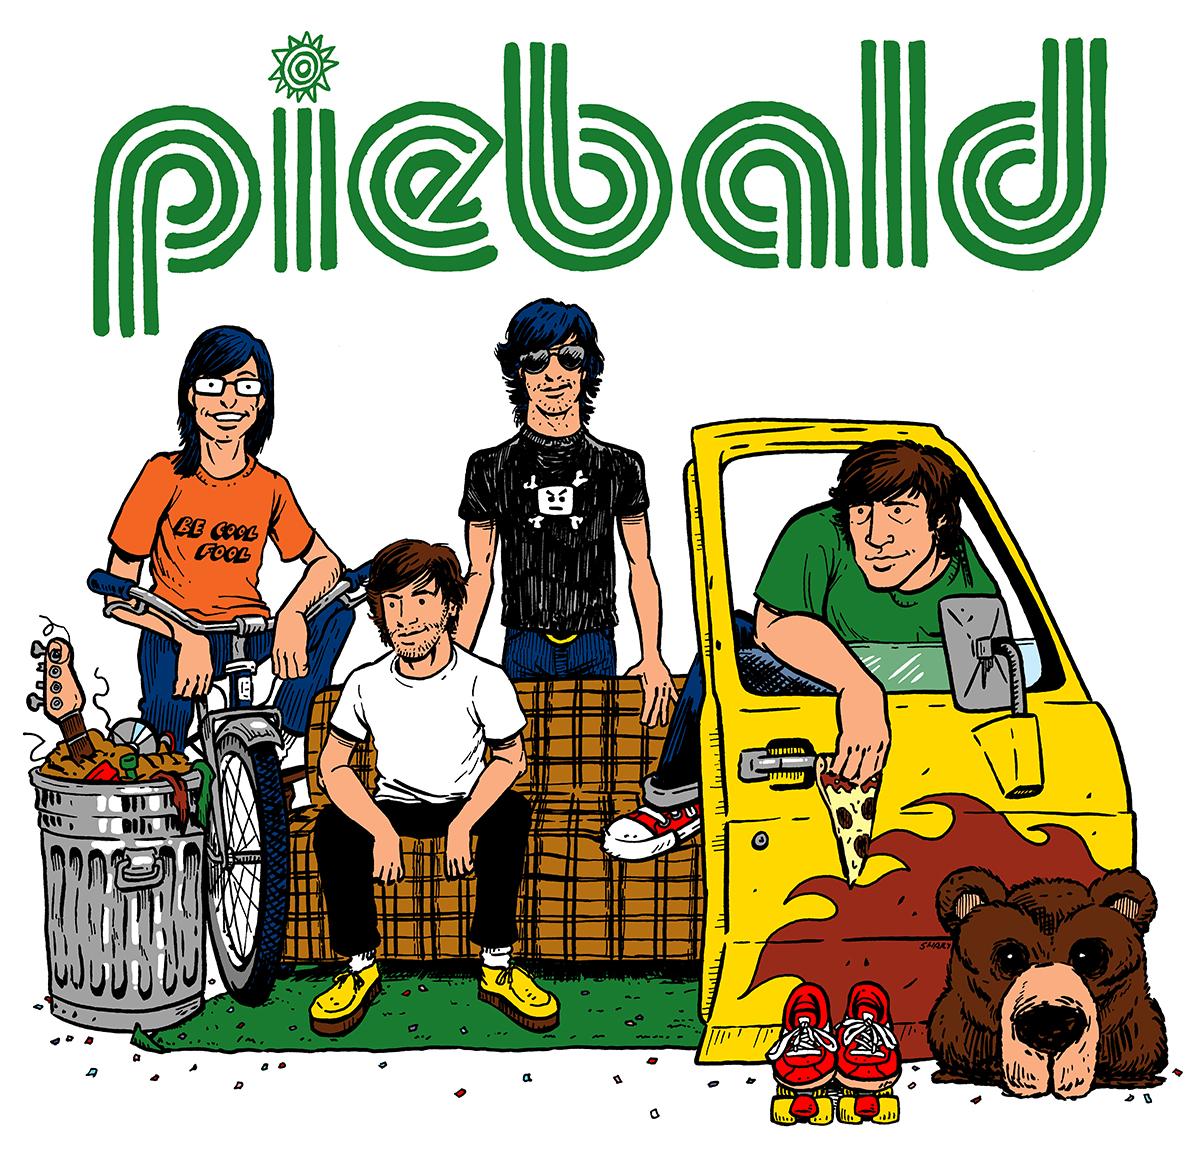 Piebald